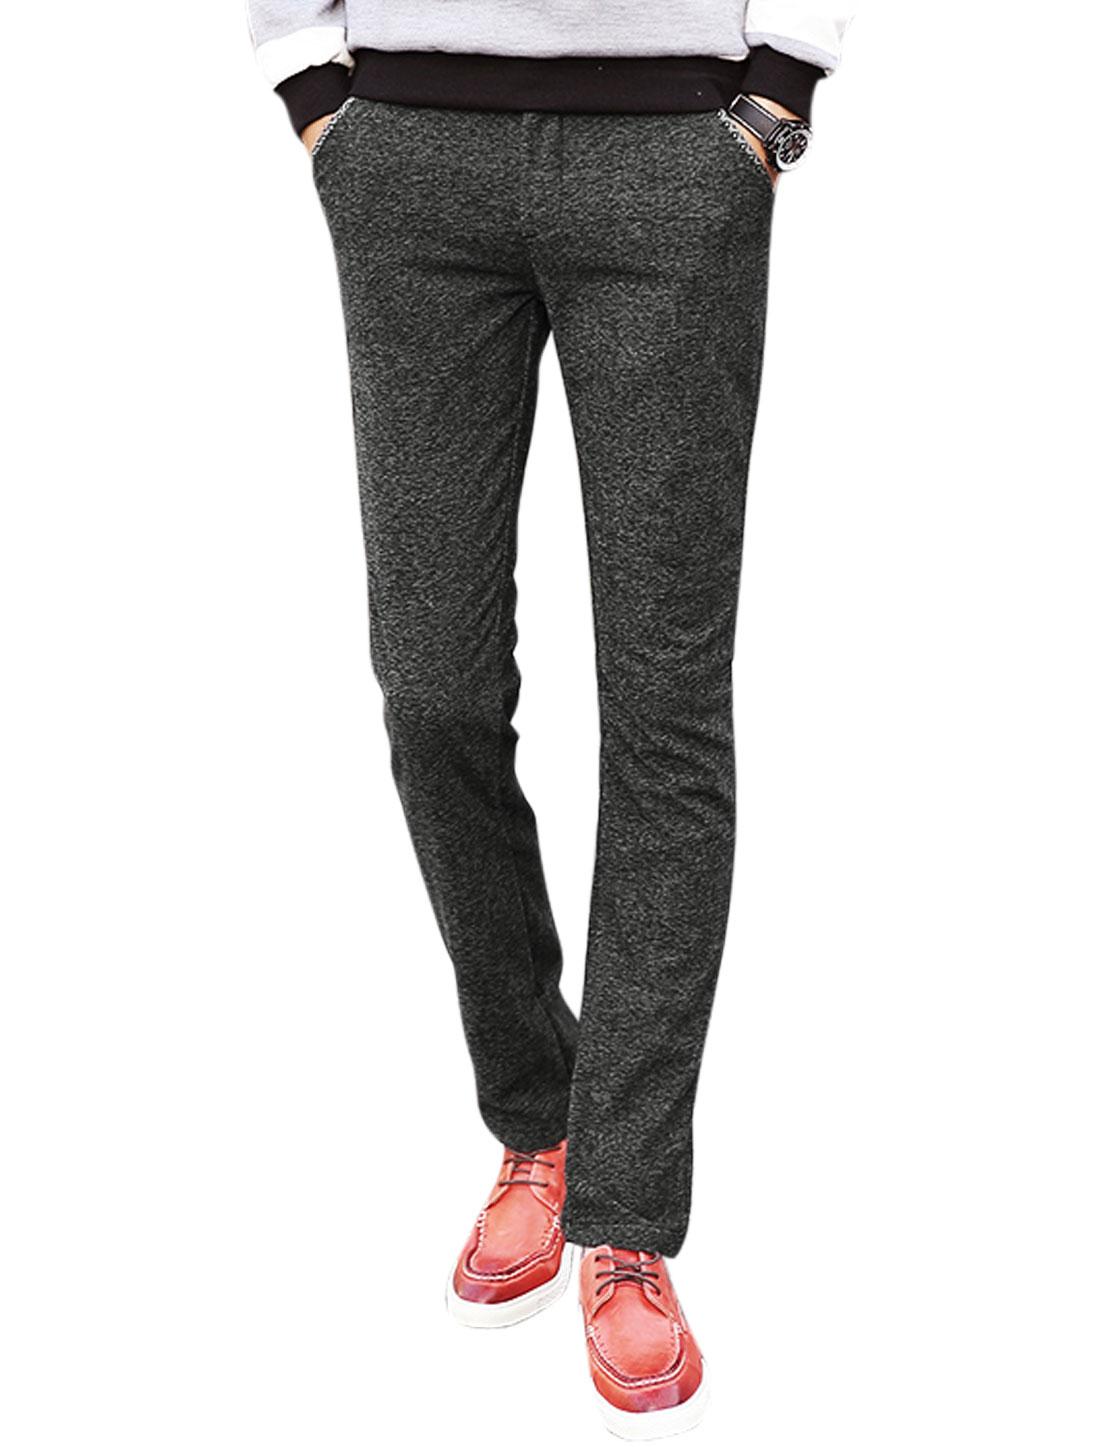 Men Novelty Stitched Multi Pockets Straight Leg Pants Gray W32